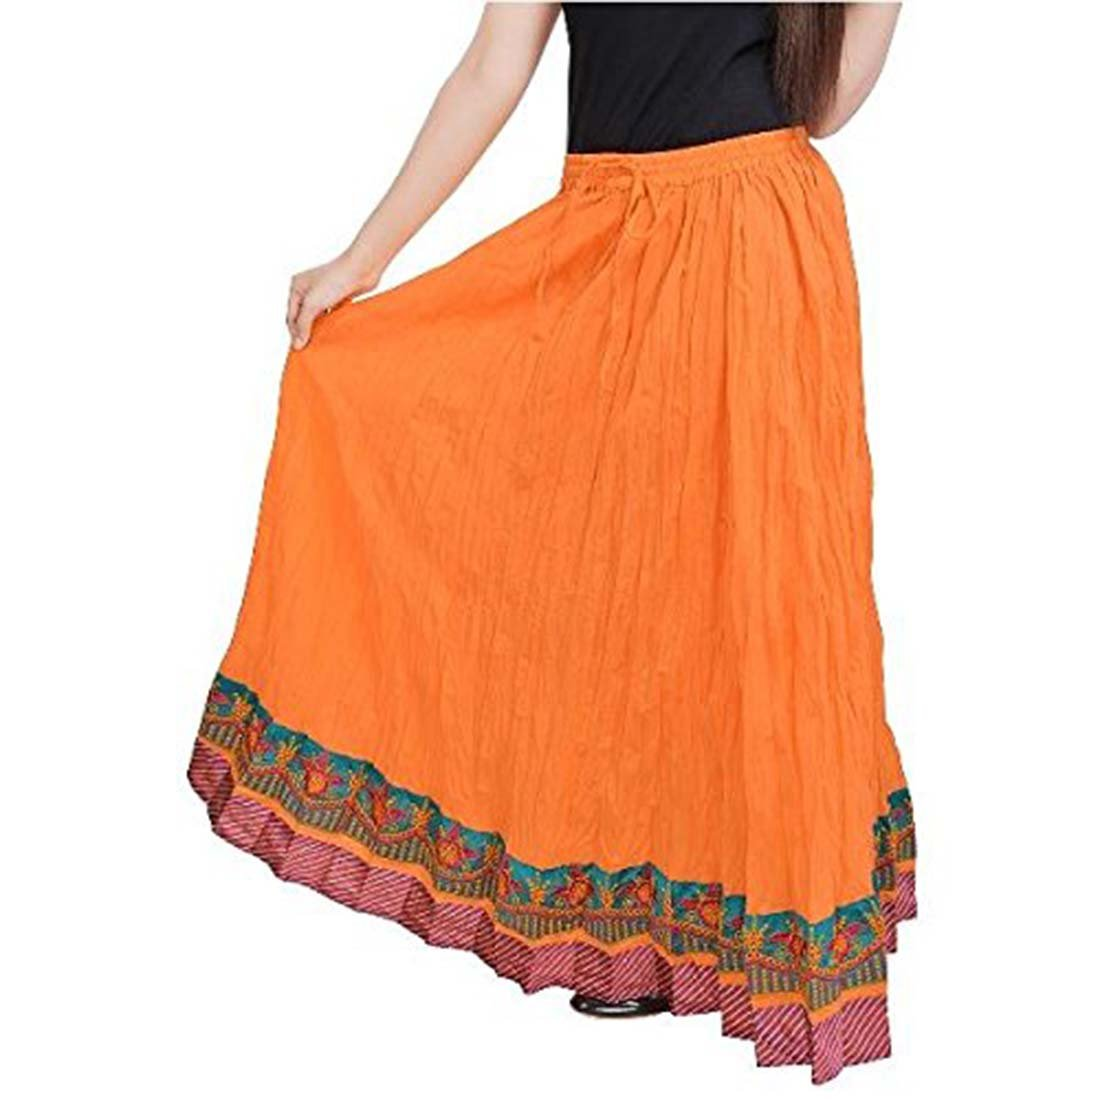 Indian Handicrfats Export Women A Beautiful Rajasthani Ornage Skirt with Border(Light orange)(SMSKT521)